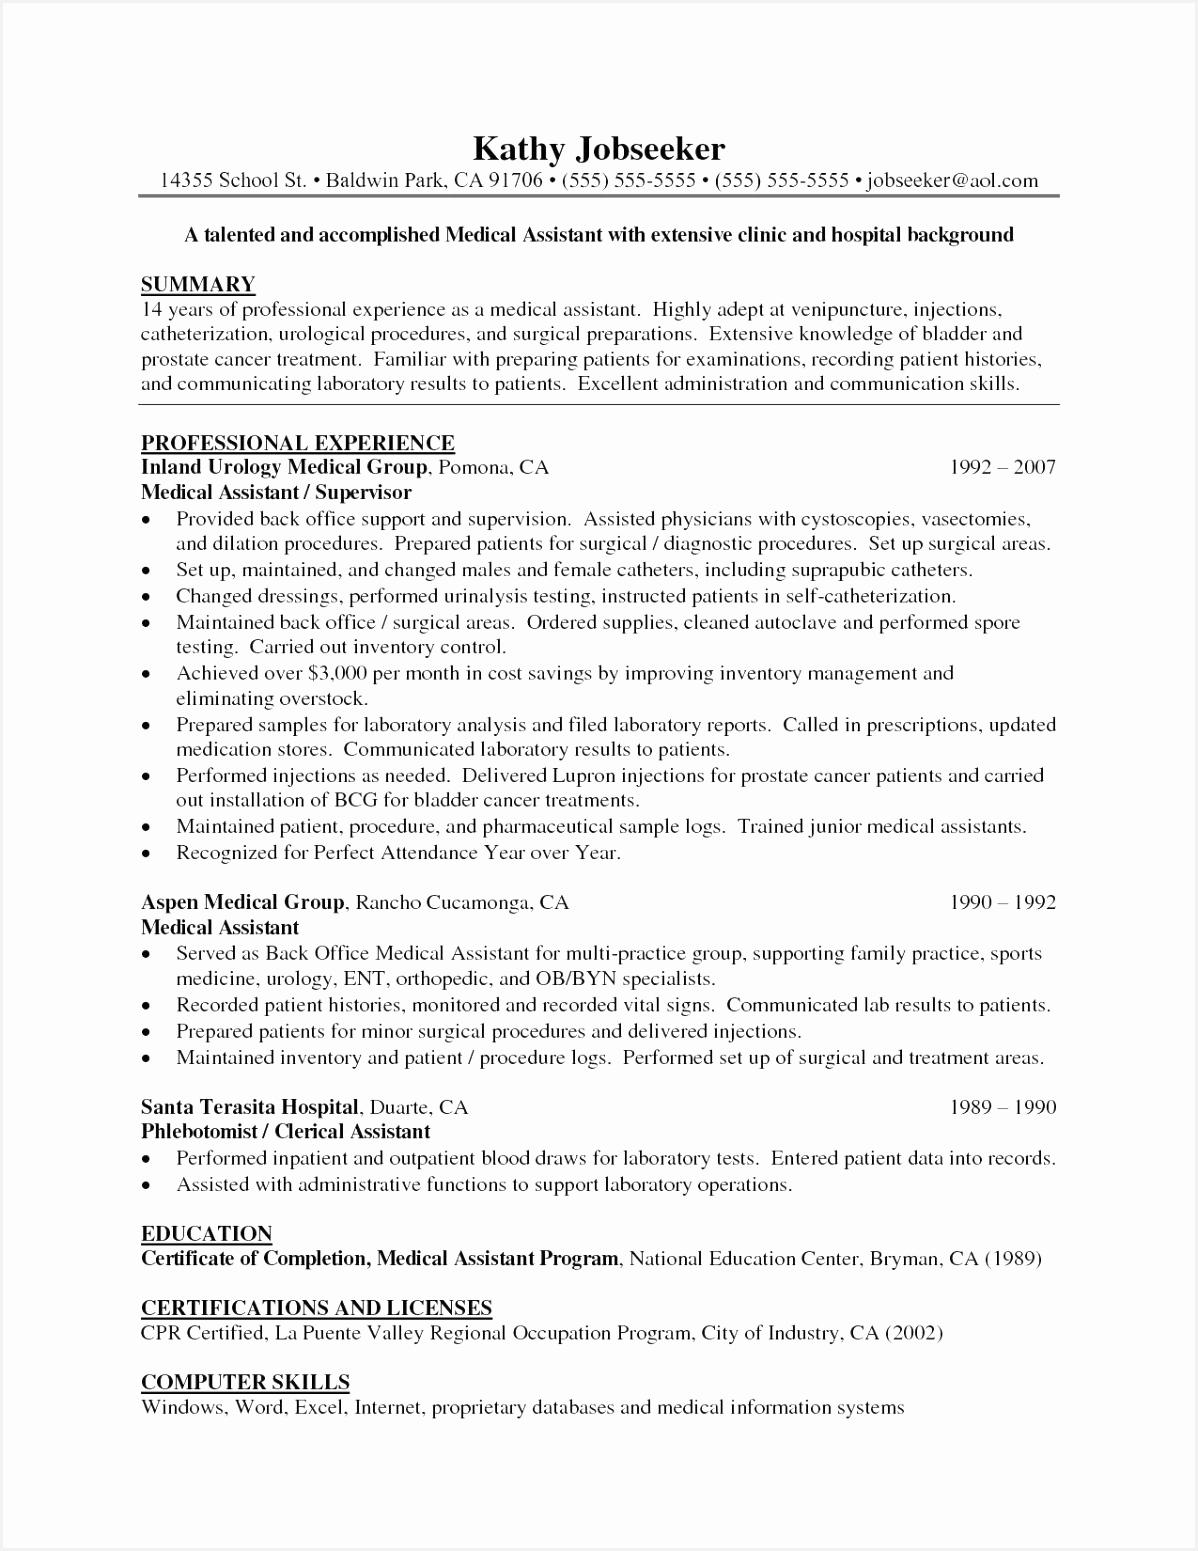 Medical assistant Resume Sumtz Luxury Sample Medical assistant Resume Of 8 Medical assistant Resume